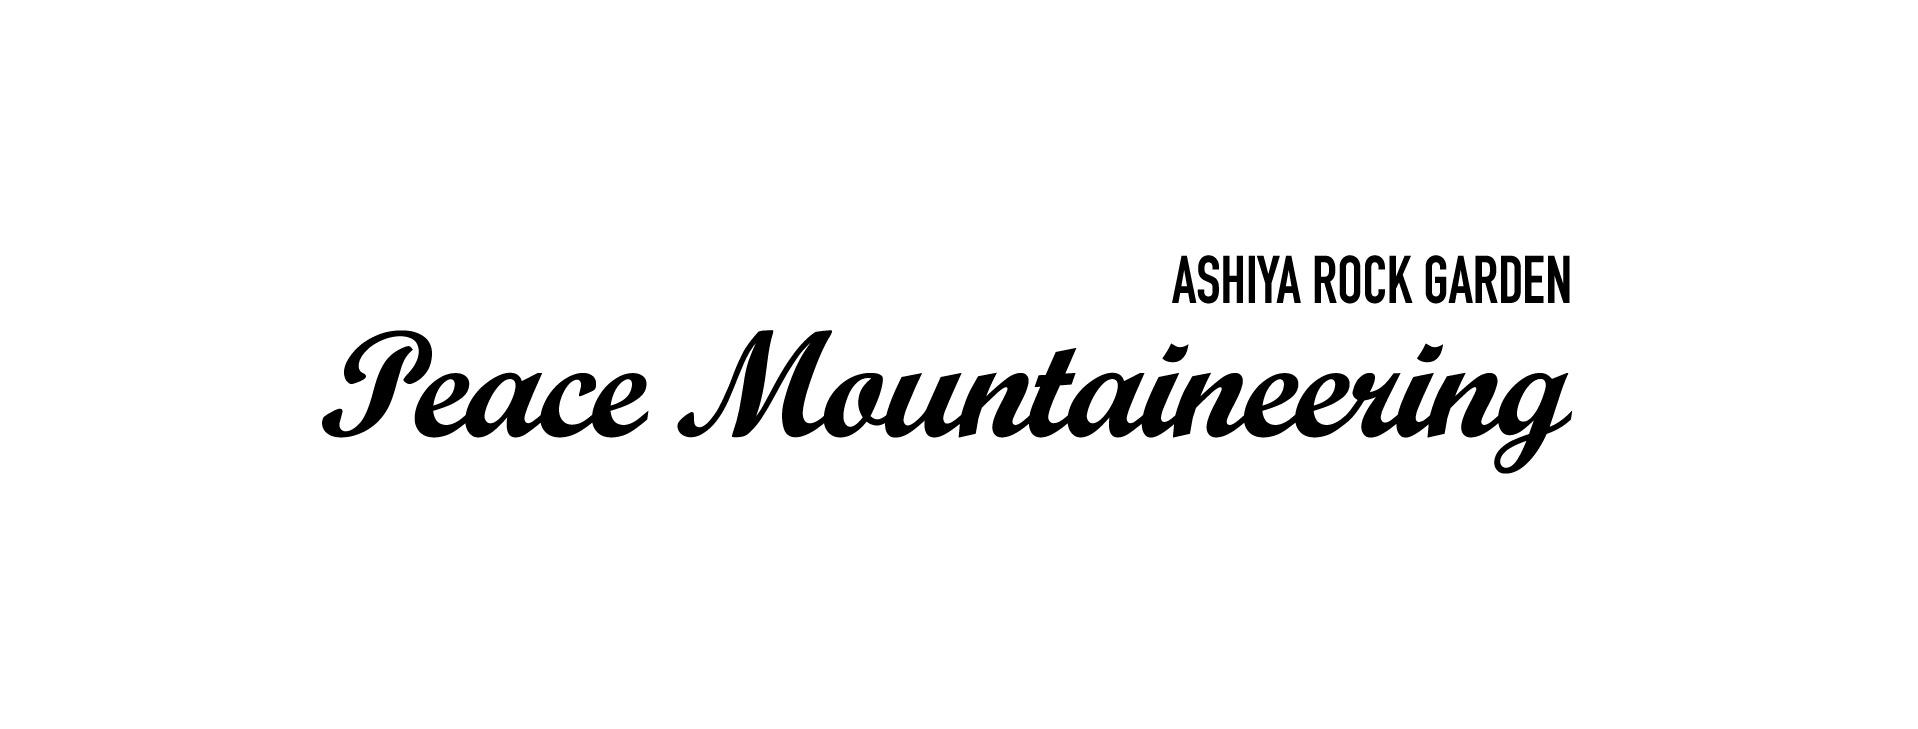 Peace Mountaineering ピースマウンテニアリング